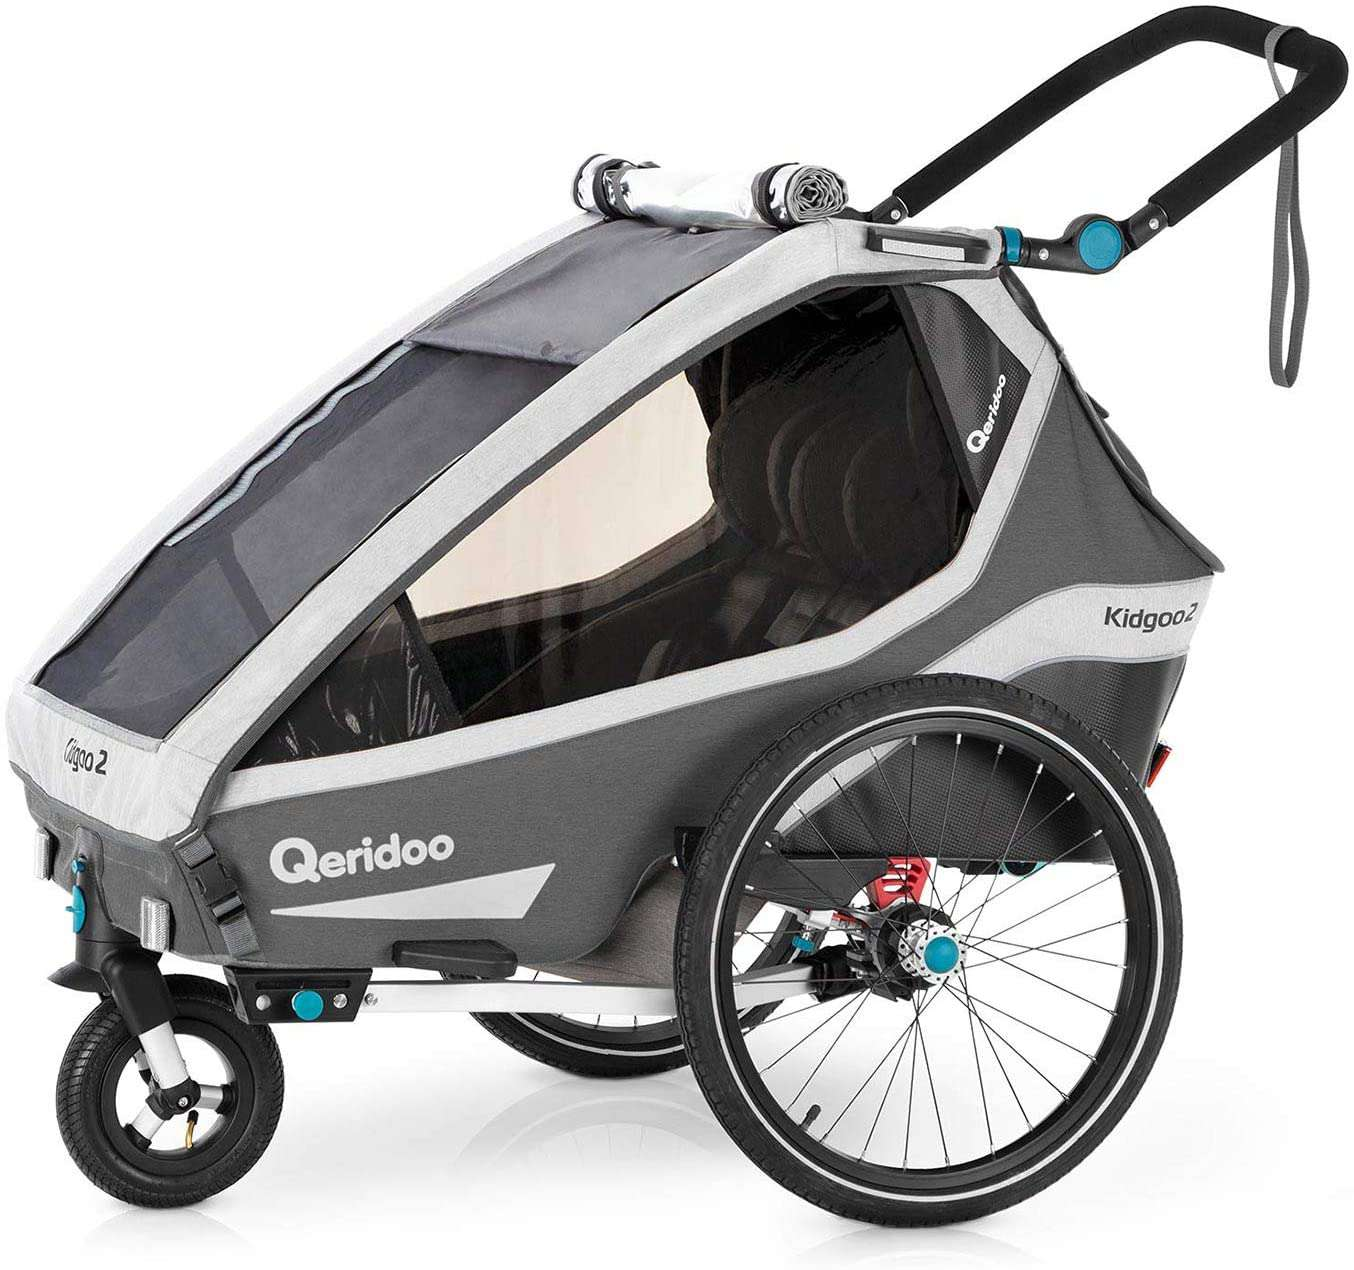 Qeridoo Kidgoo2 Double 2 Seat Kids Bike Trailer & Stroller